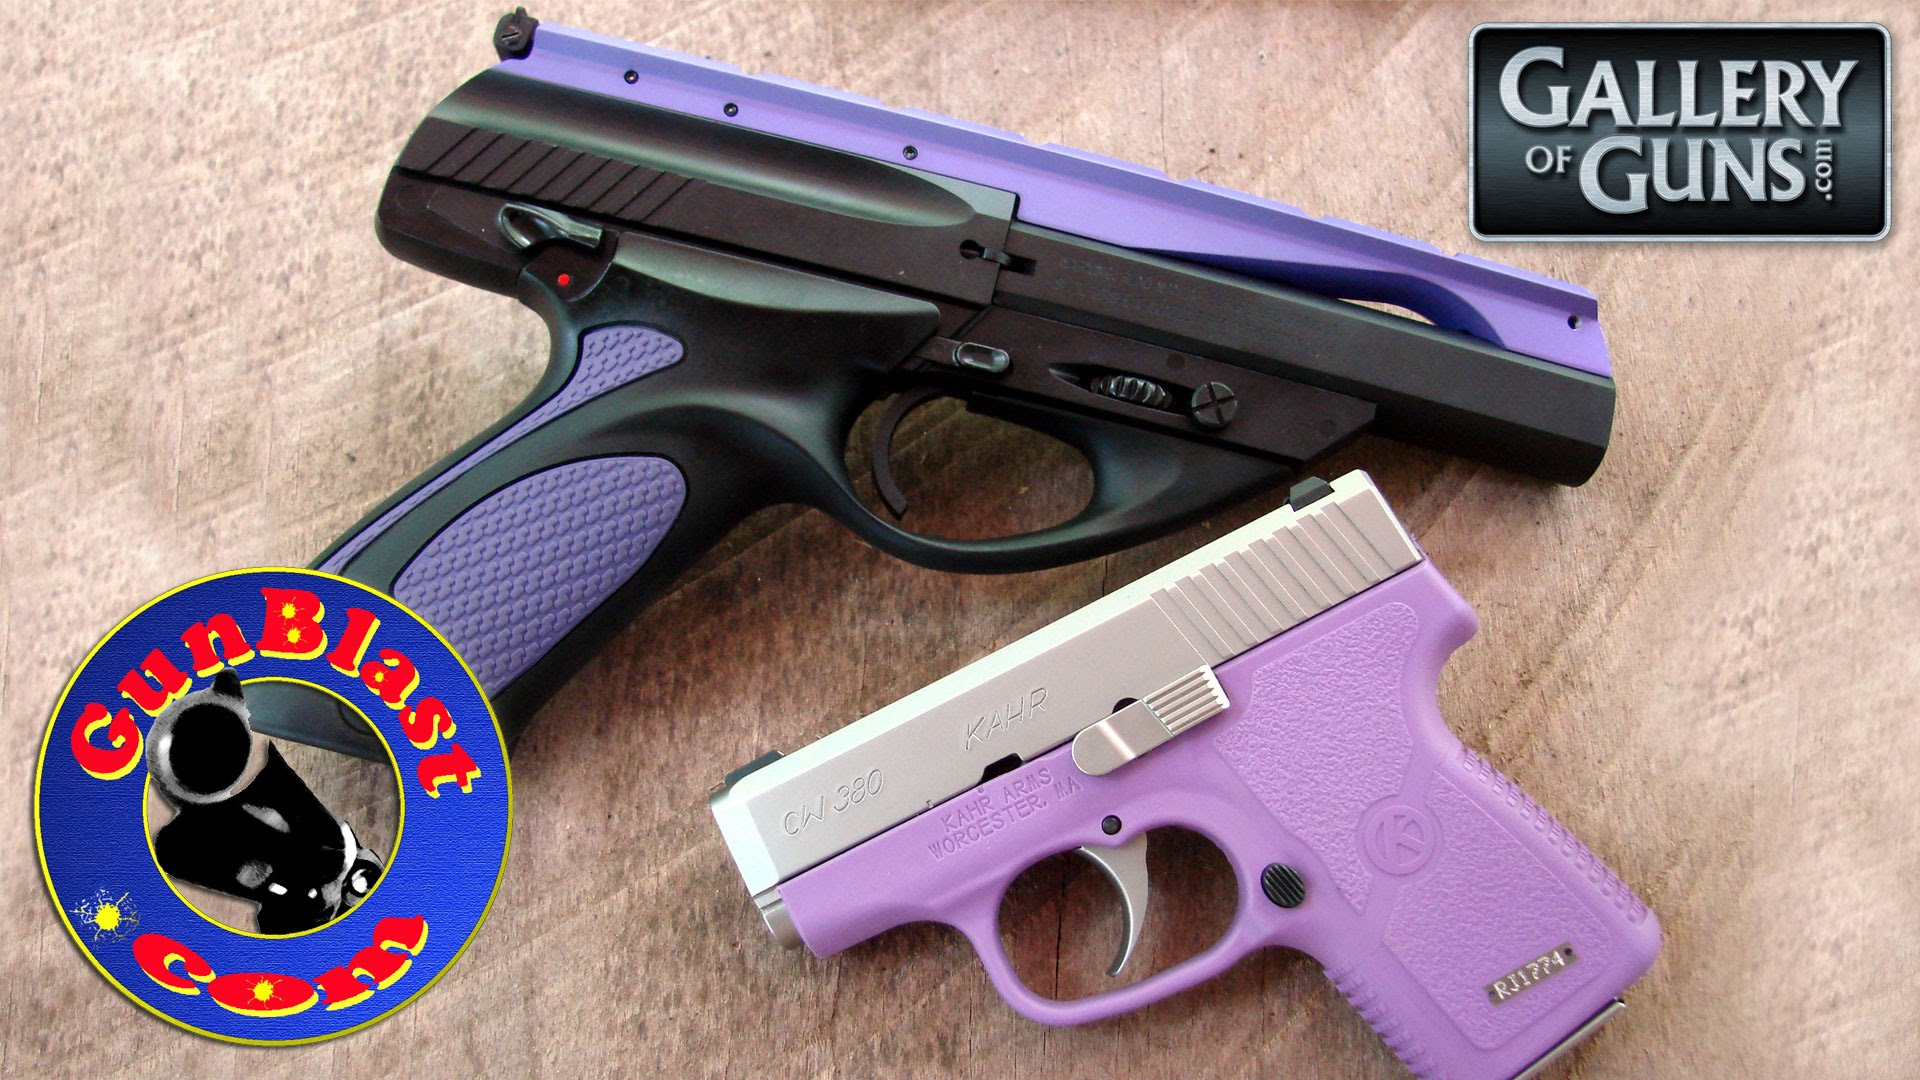 Special Edition Beretta U22 Neos and Kahr CW380